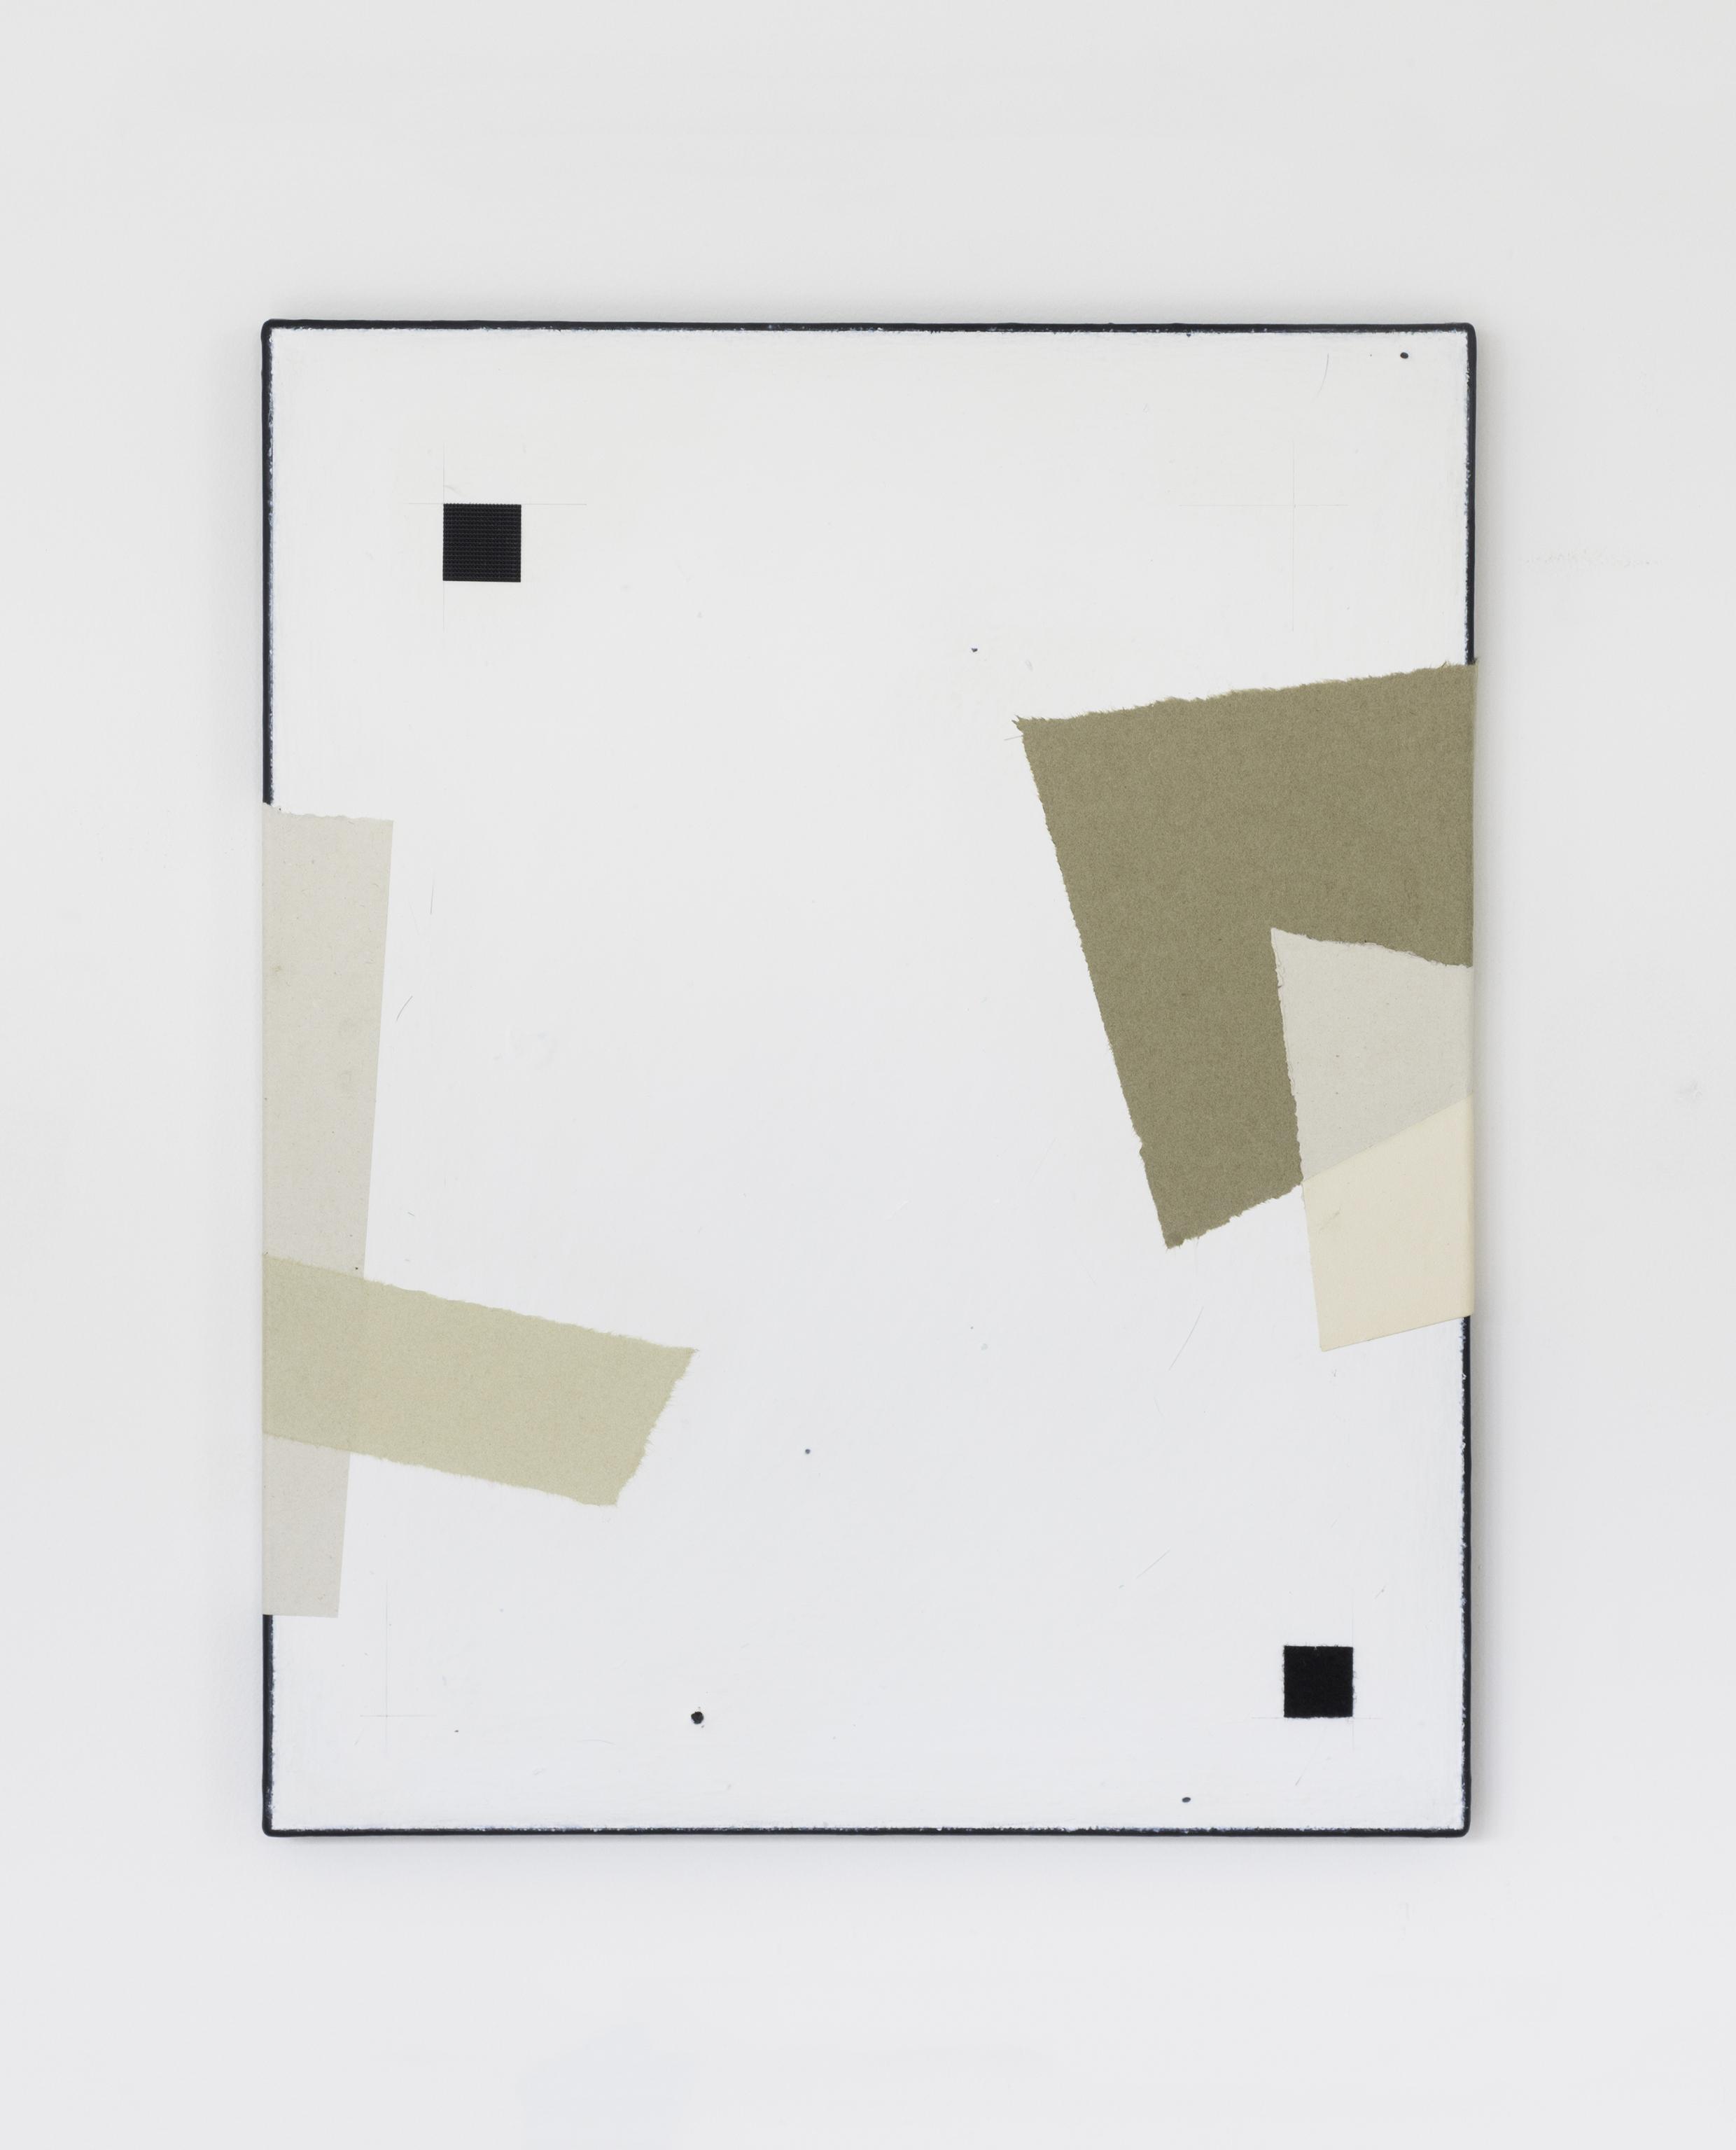 Painting No.1 2015 Awagami paper, Velcro, paint, linen, stretcher frame 40 x 50 cm $5000 USD